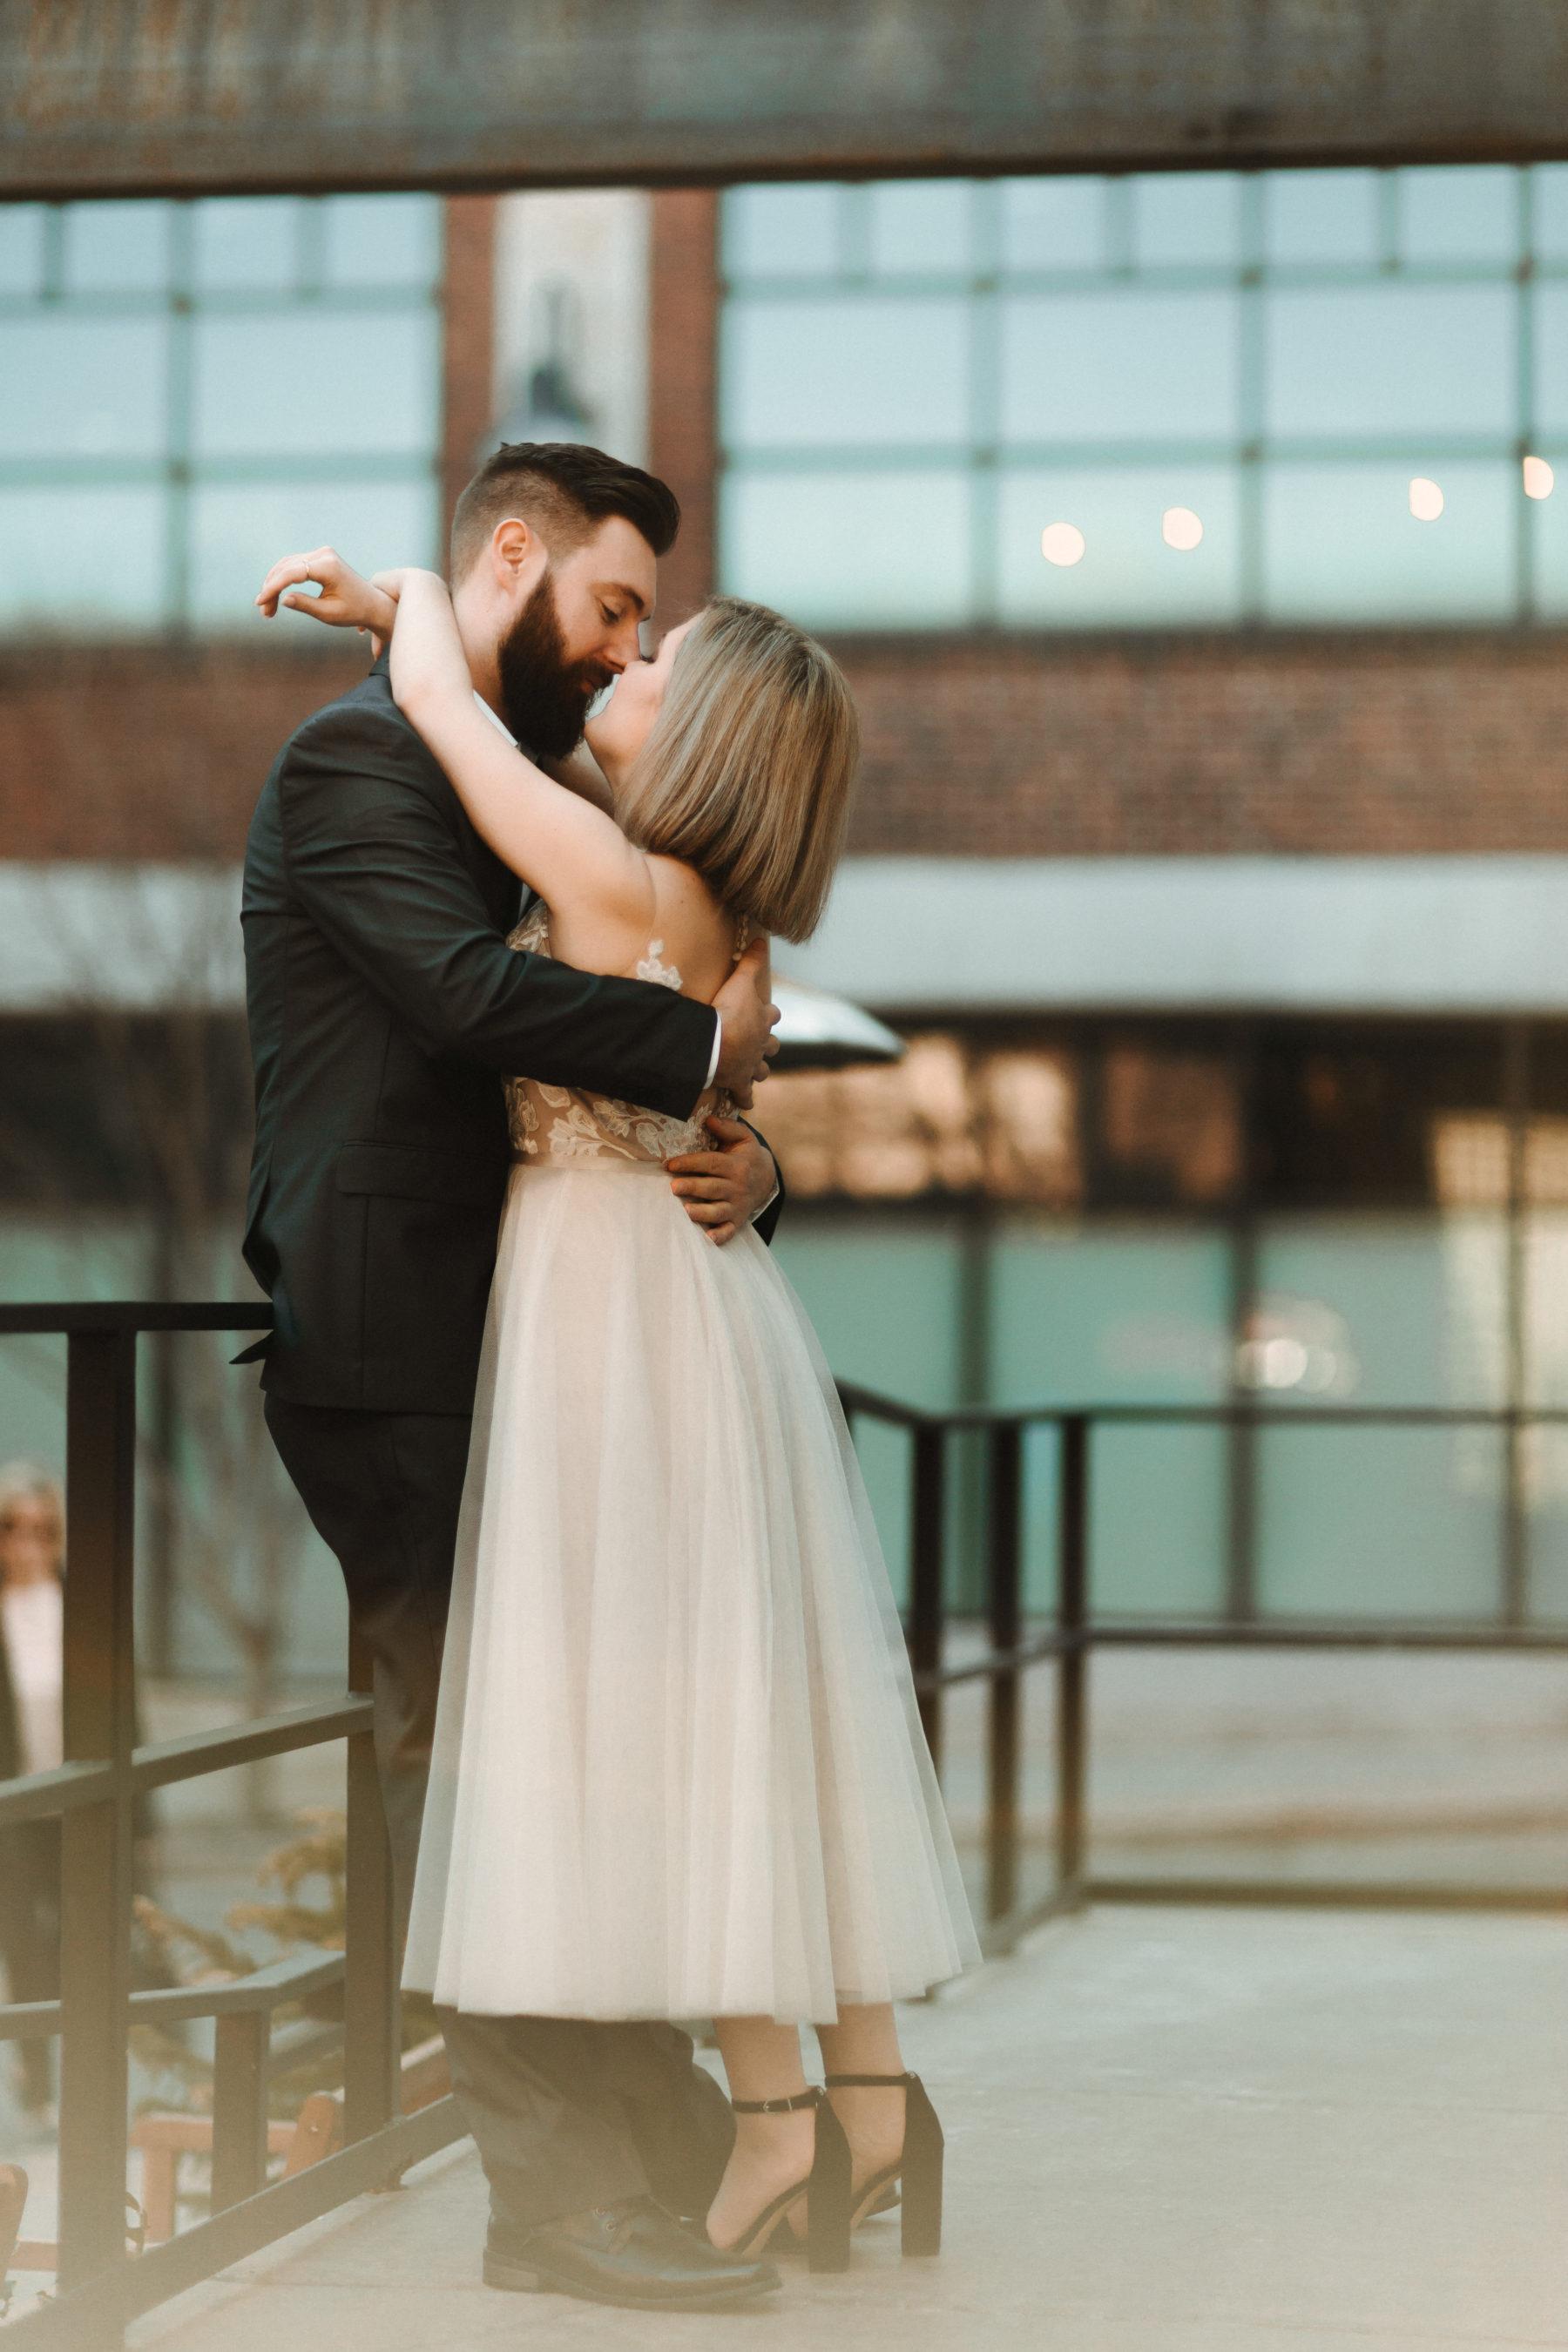 Nashville Wedding Photographer: Nashville brunch elopement featured on Nashville Bride Guide